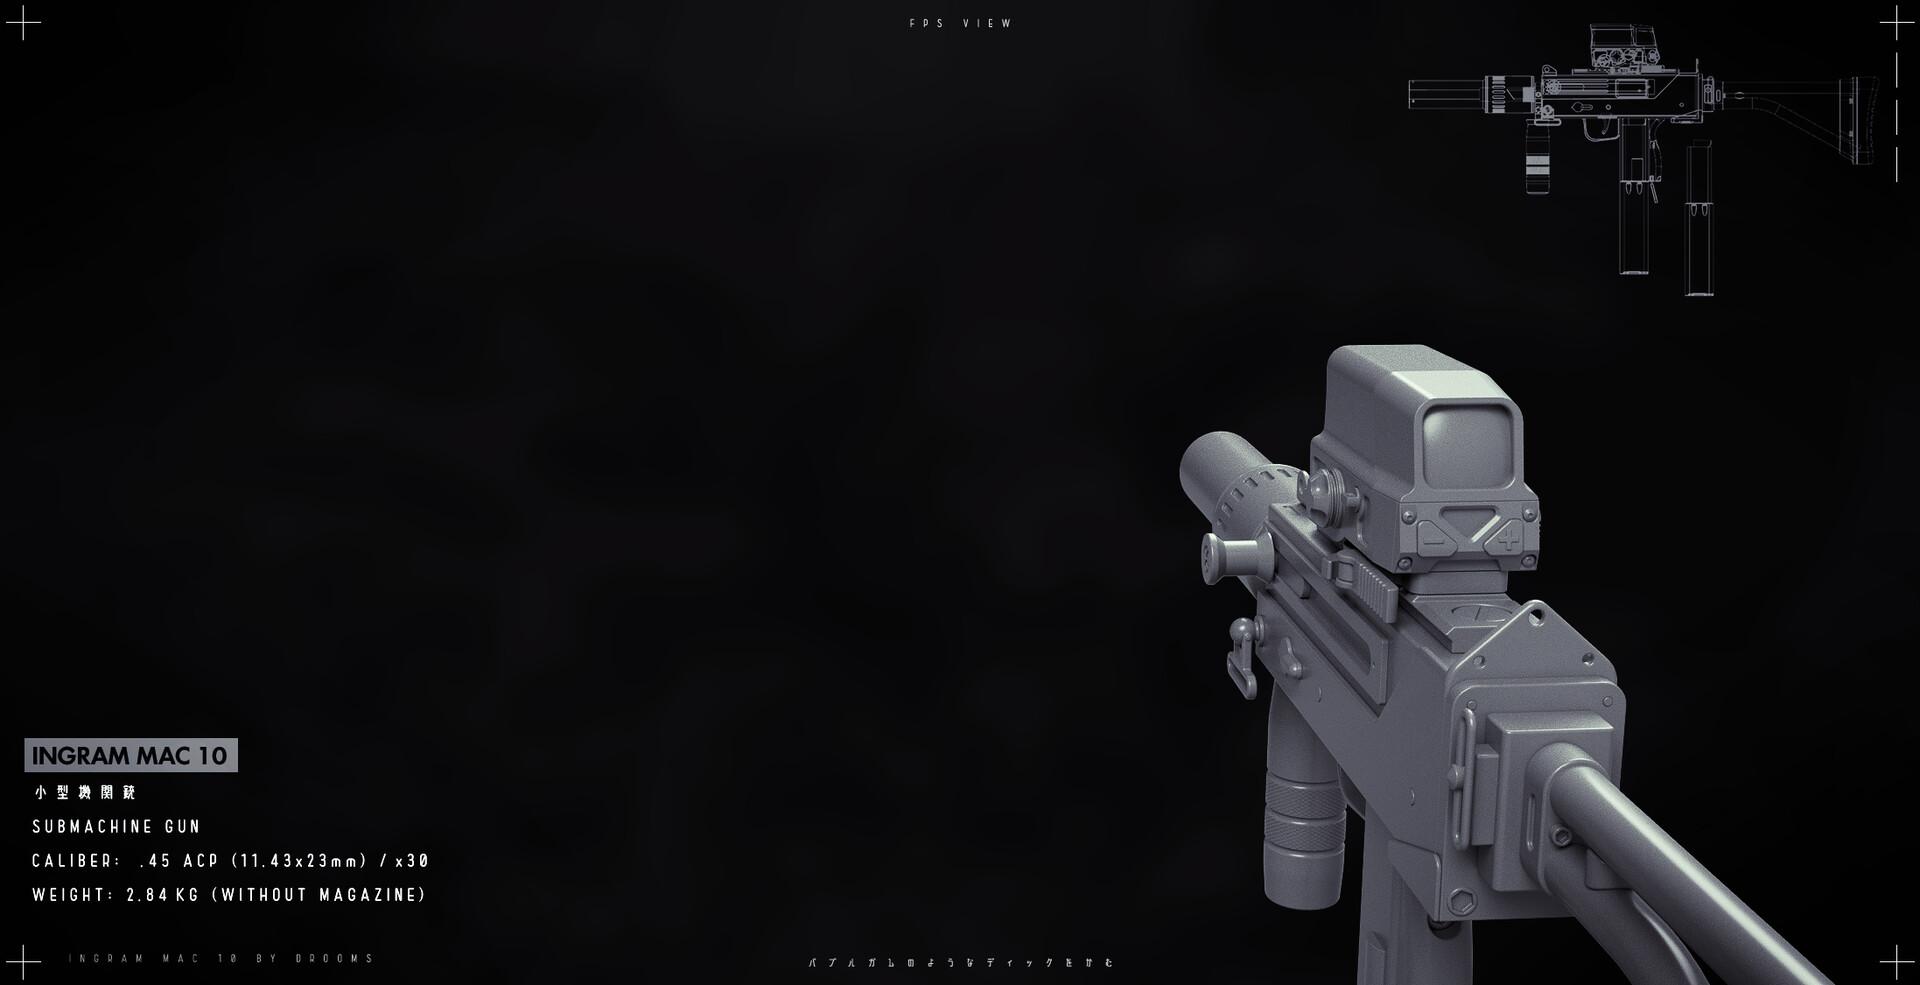 ArtStation - INGRAM MAC 10 Mod - Submachine Gun, John Kilbride